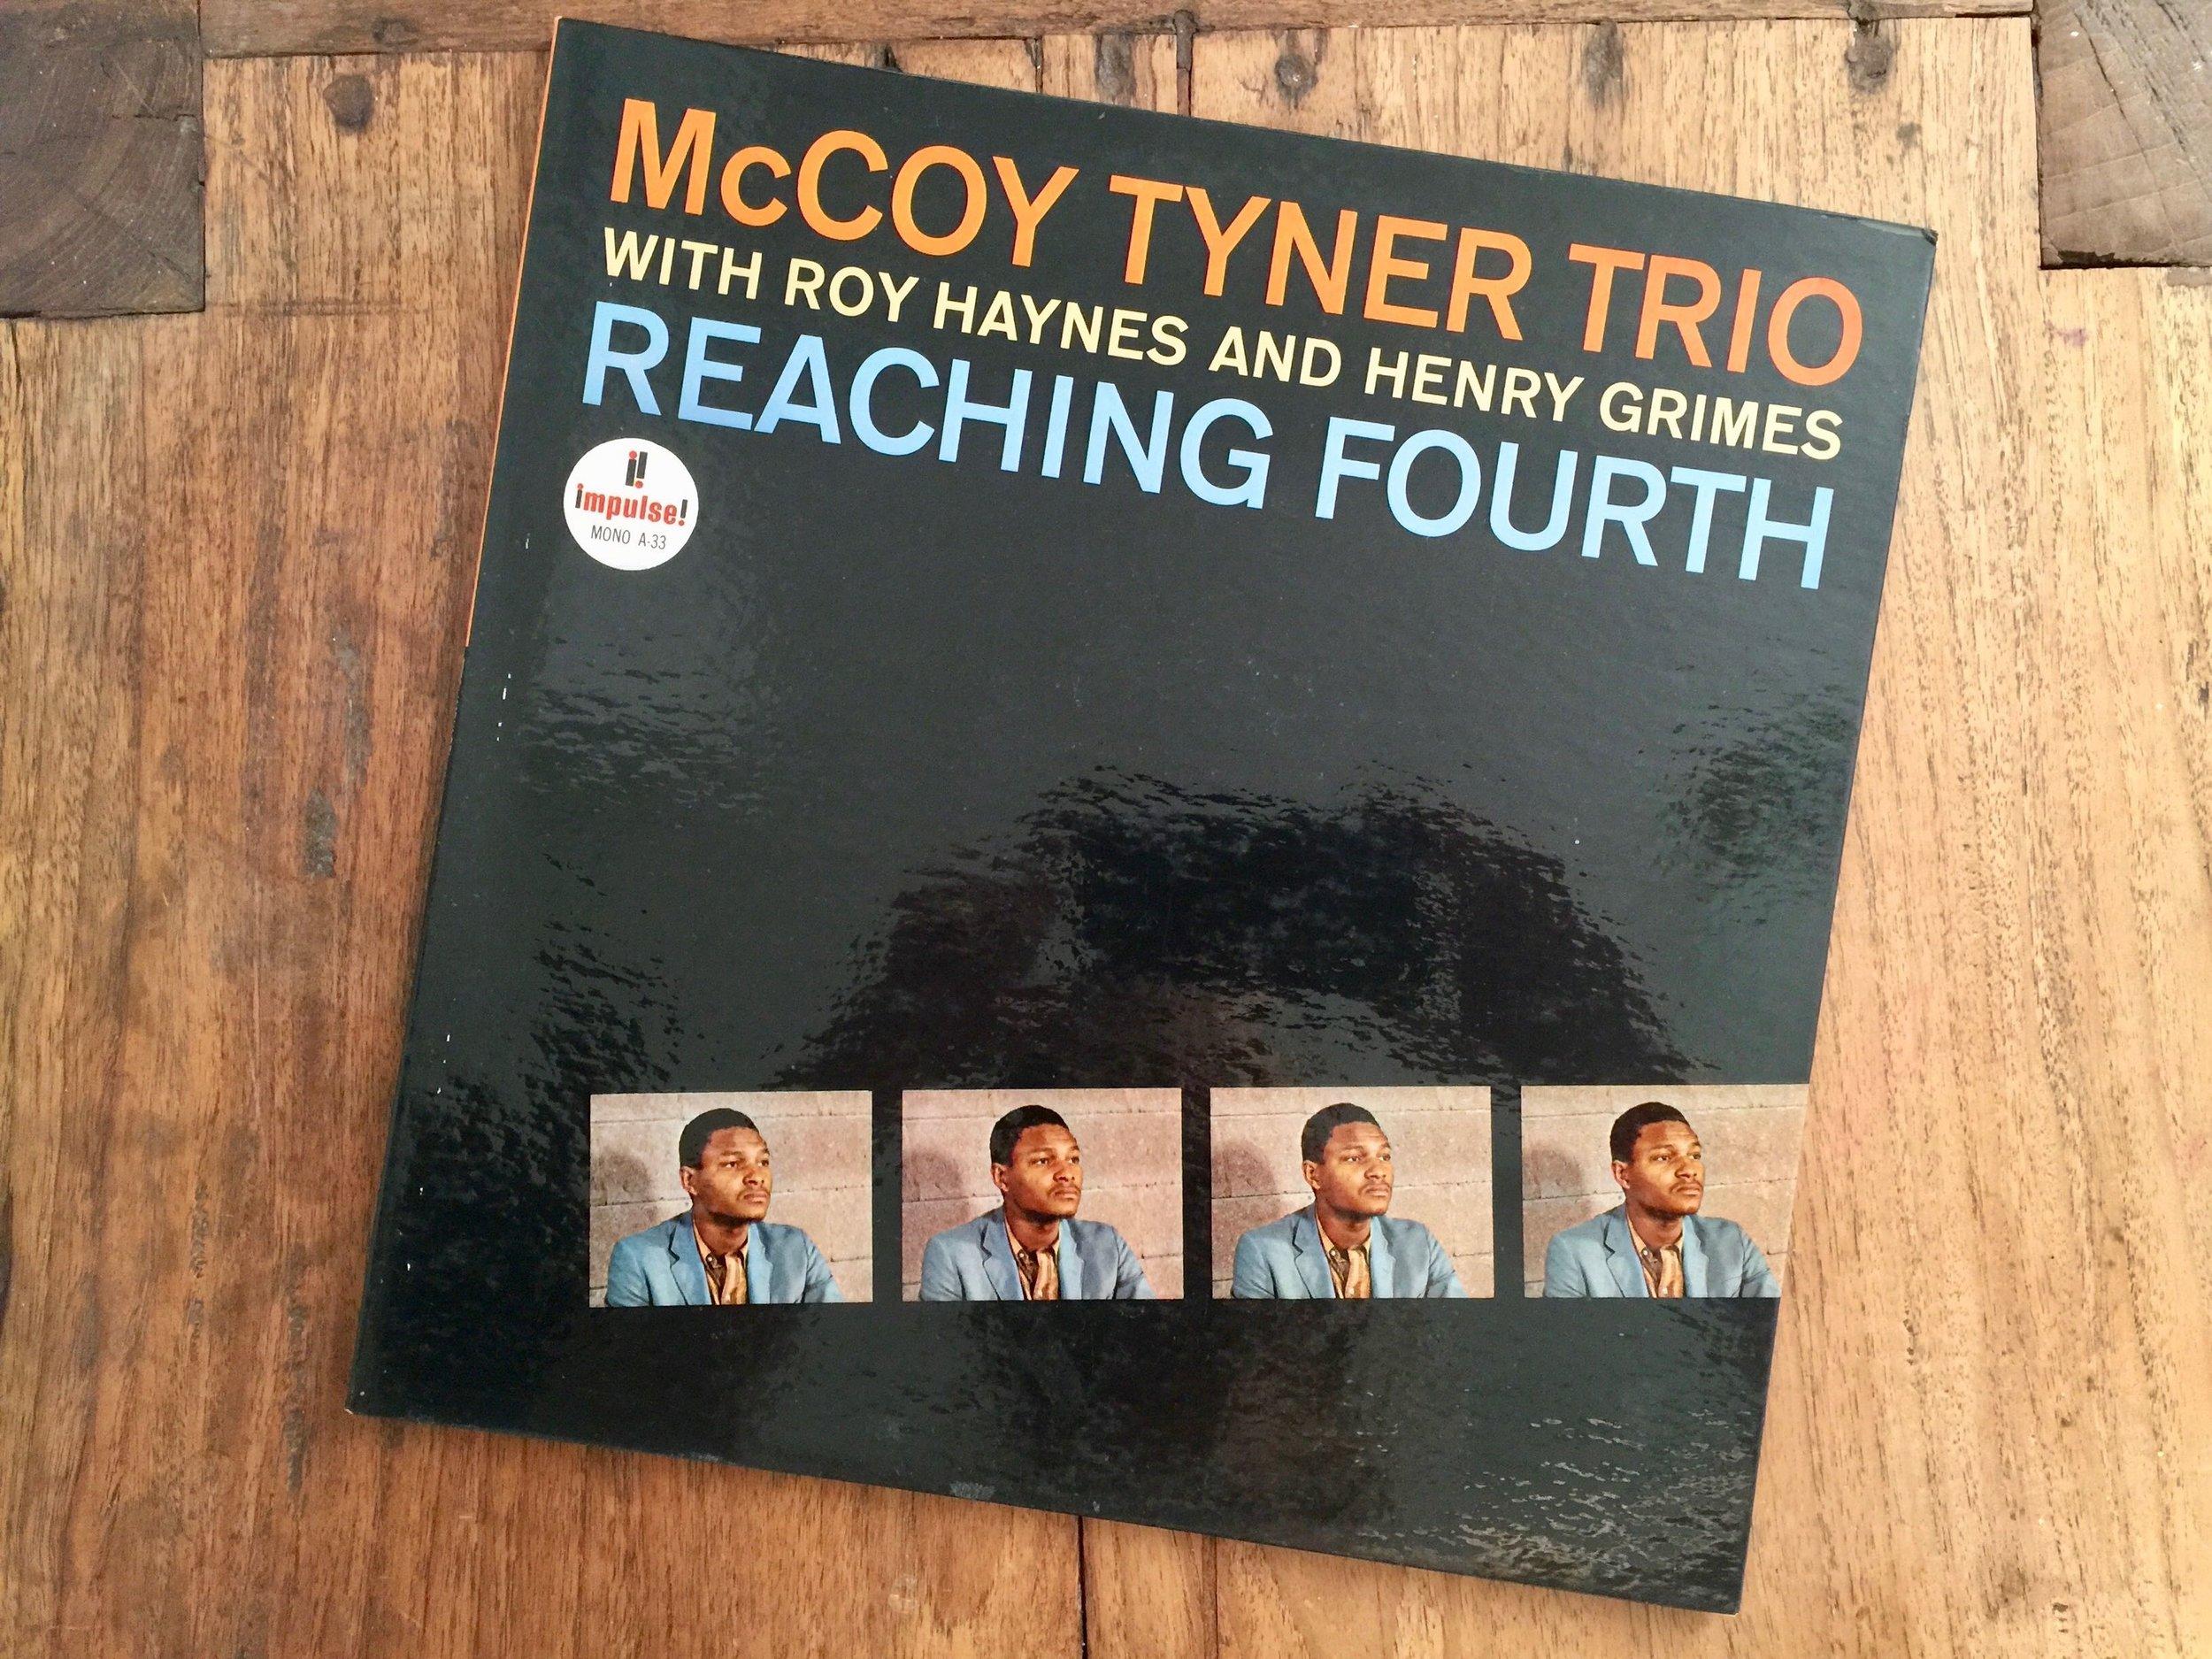 A very satisfying jazz piano trio album.